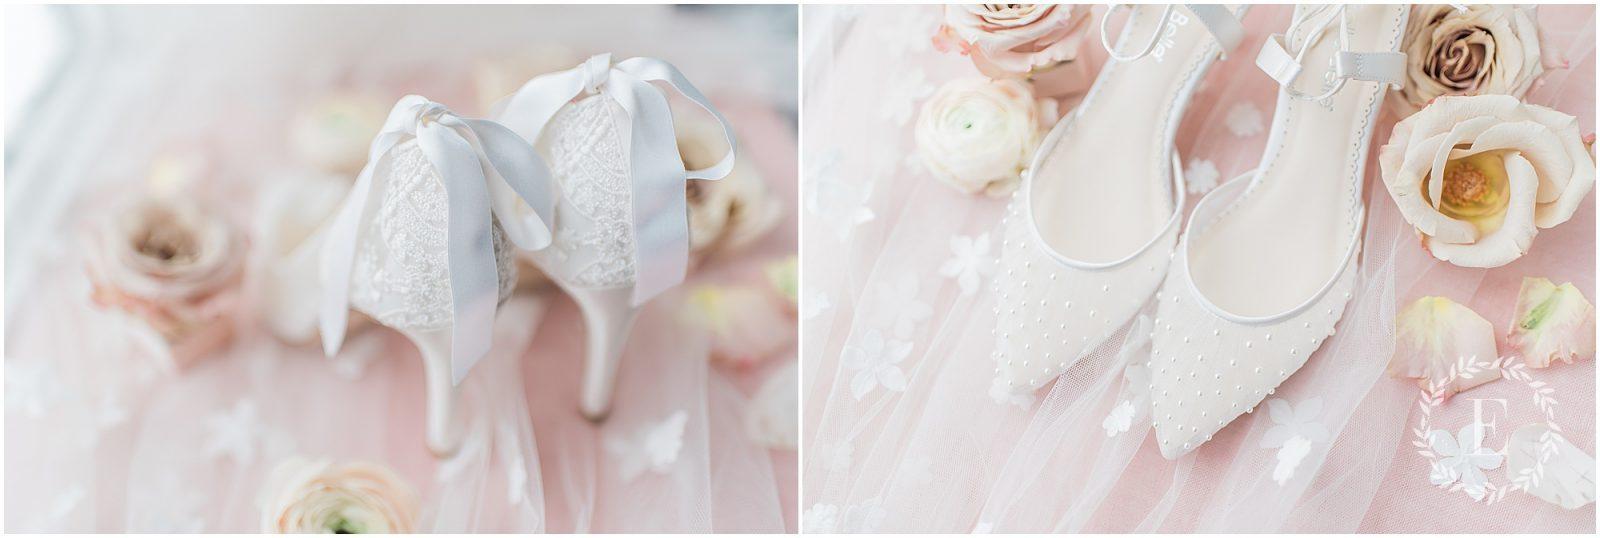 18 - Bella Belle for Fairy Dreams Bridal - PhotosbyEmmaH 2019.jpg